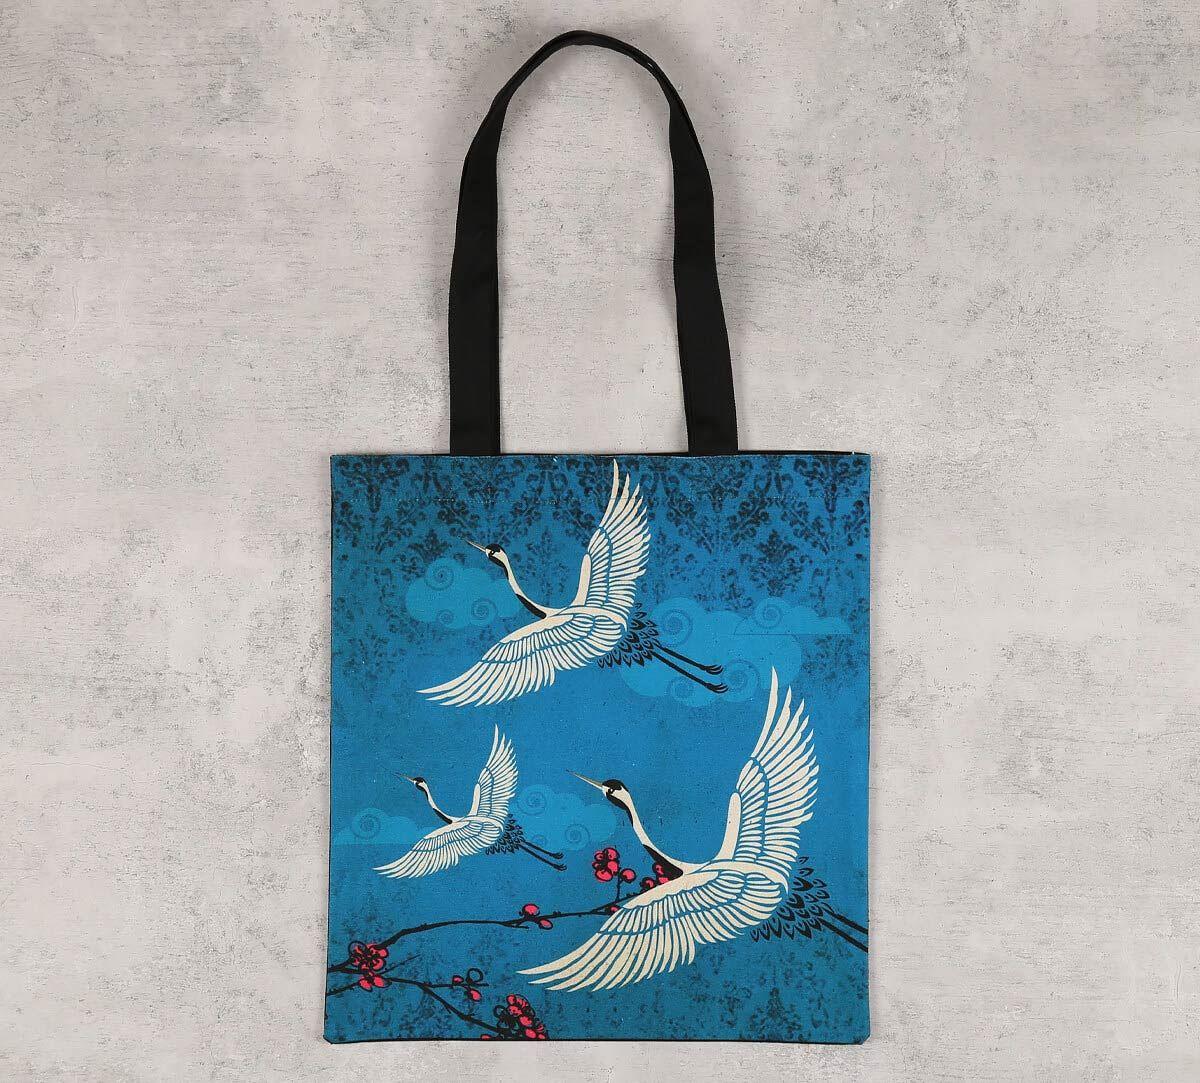 India Circus Legend of the Cranes Jhola Bag